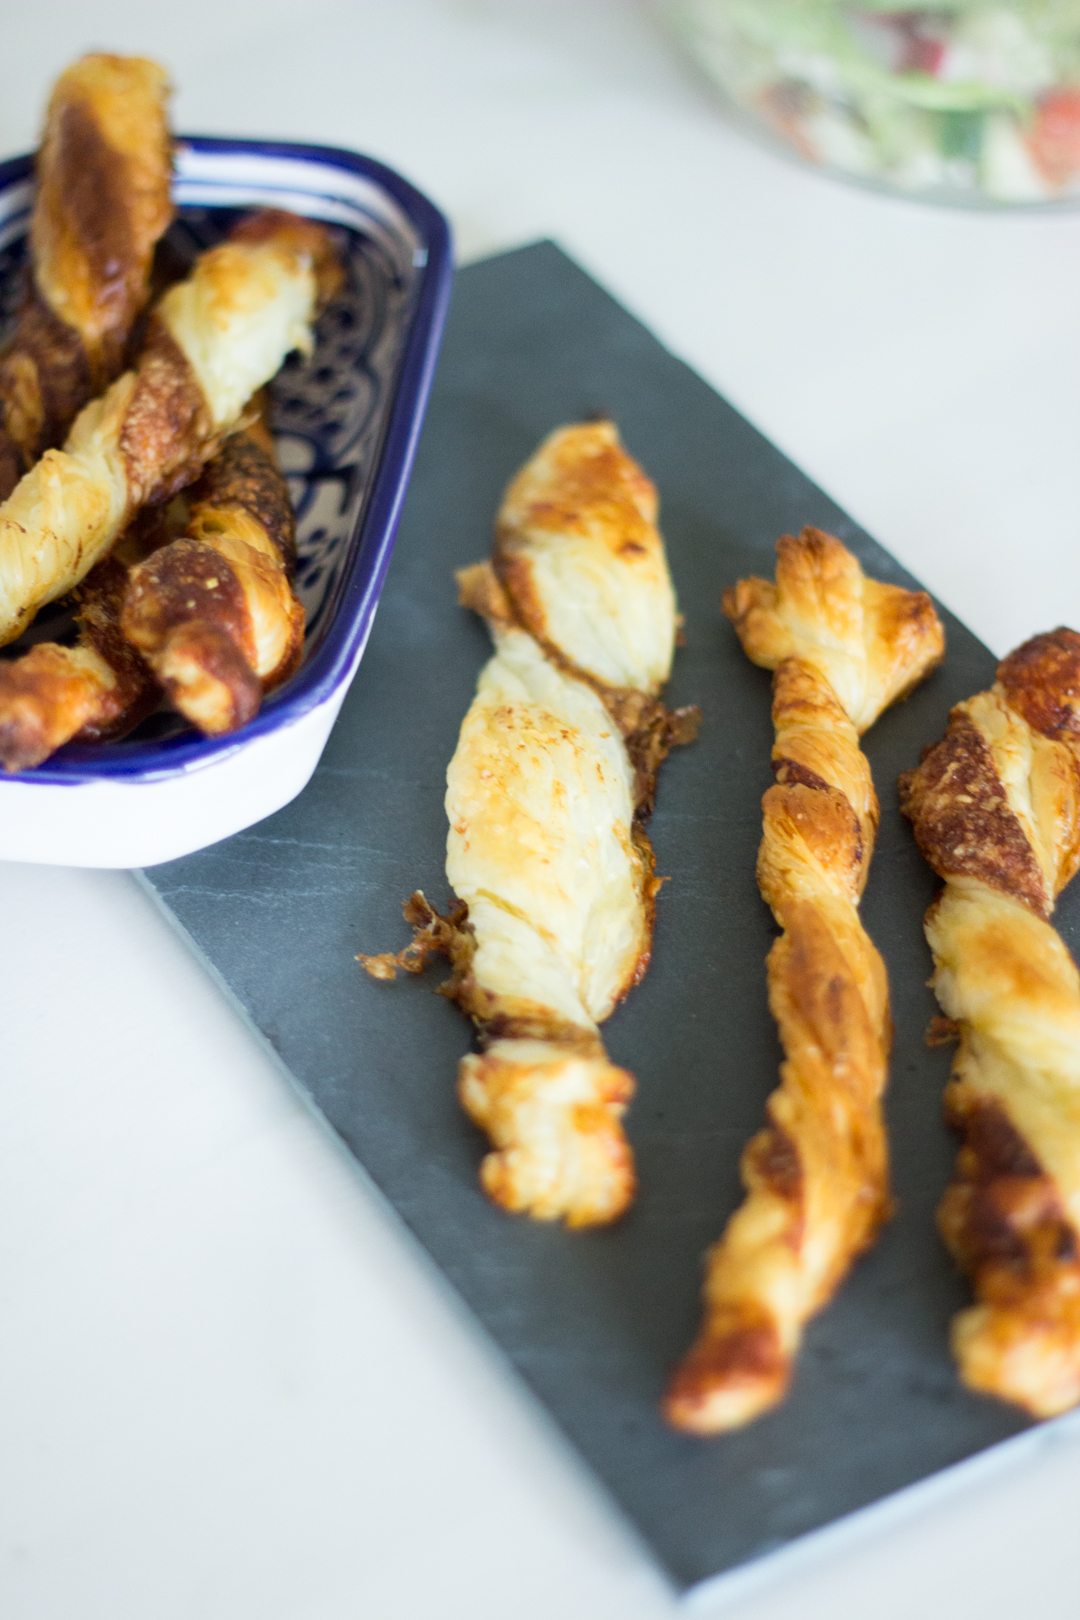 (Recipe) Vegemite Sticks An Australia Inspired Snack